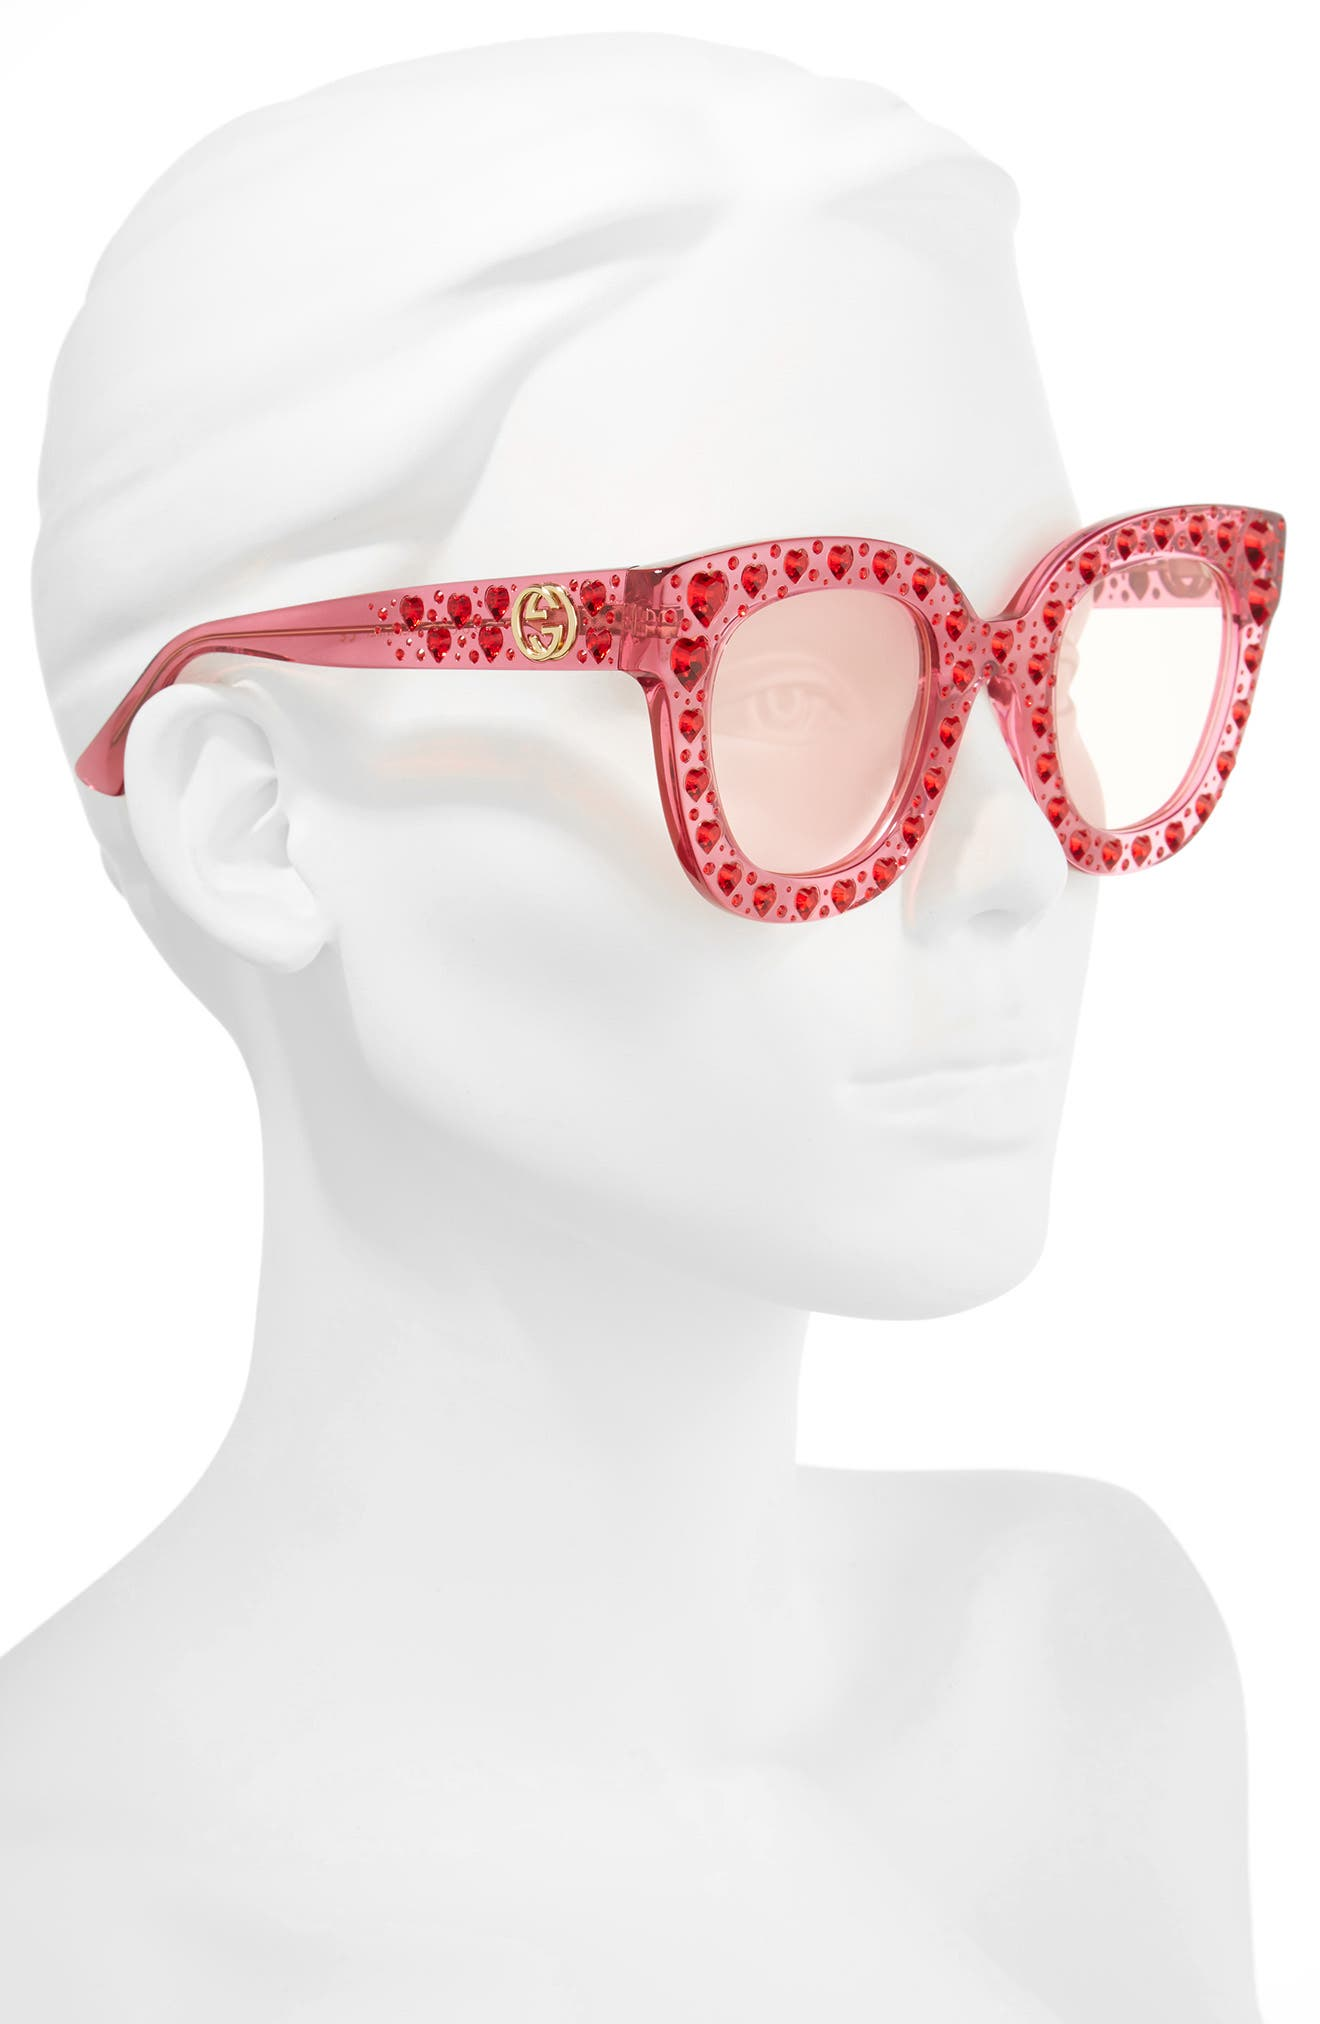 49mm Crystal Heart Sunglasses,                             Alternate thumbnail 2, color,                             FUCHSIA